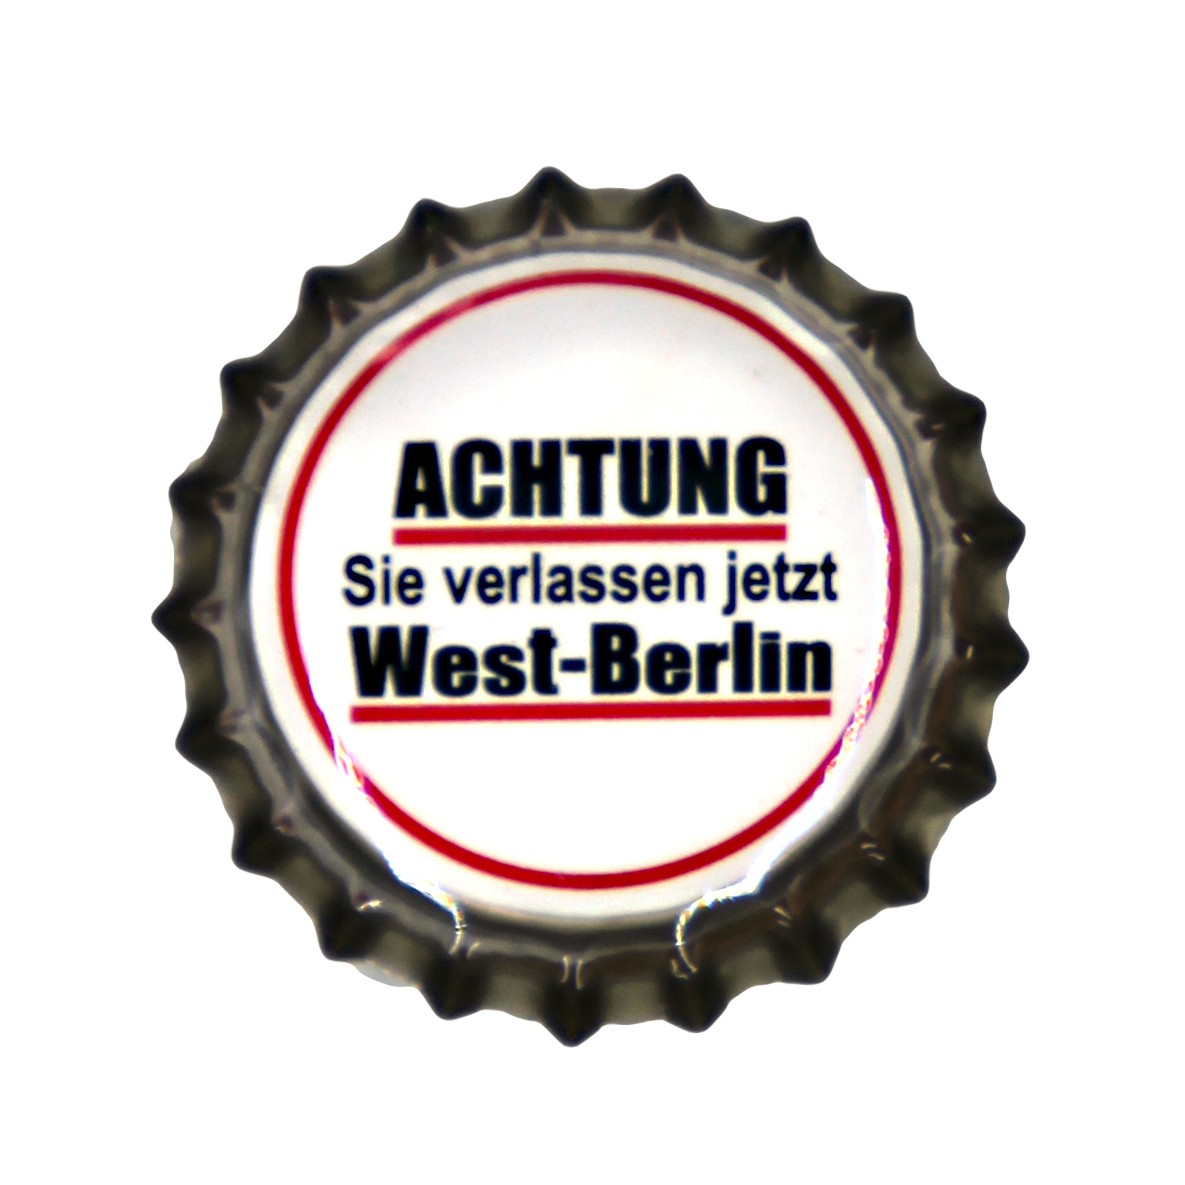 Magnet Kronkorken Achtung West-Berlin